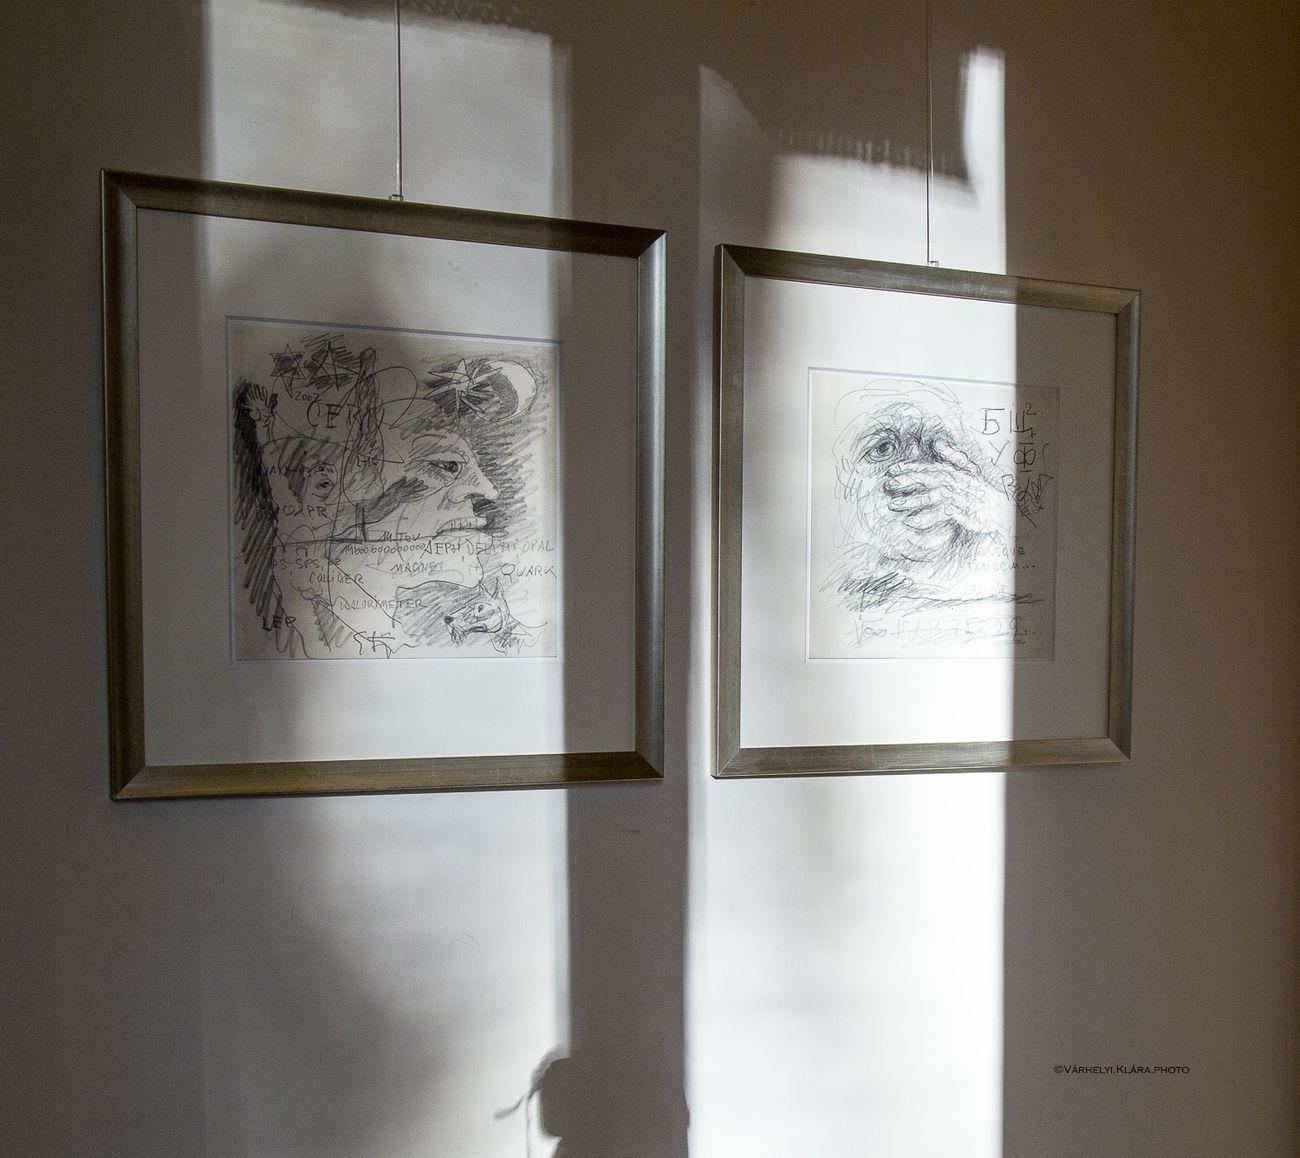 Karl Stengel. Con cuore puro. Exhibition view at Accademia d'Ungheria, Roma 2020. Photo Klára Várhelyi